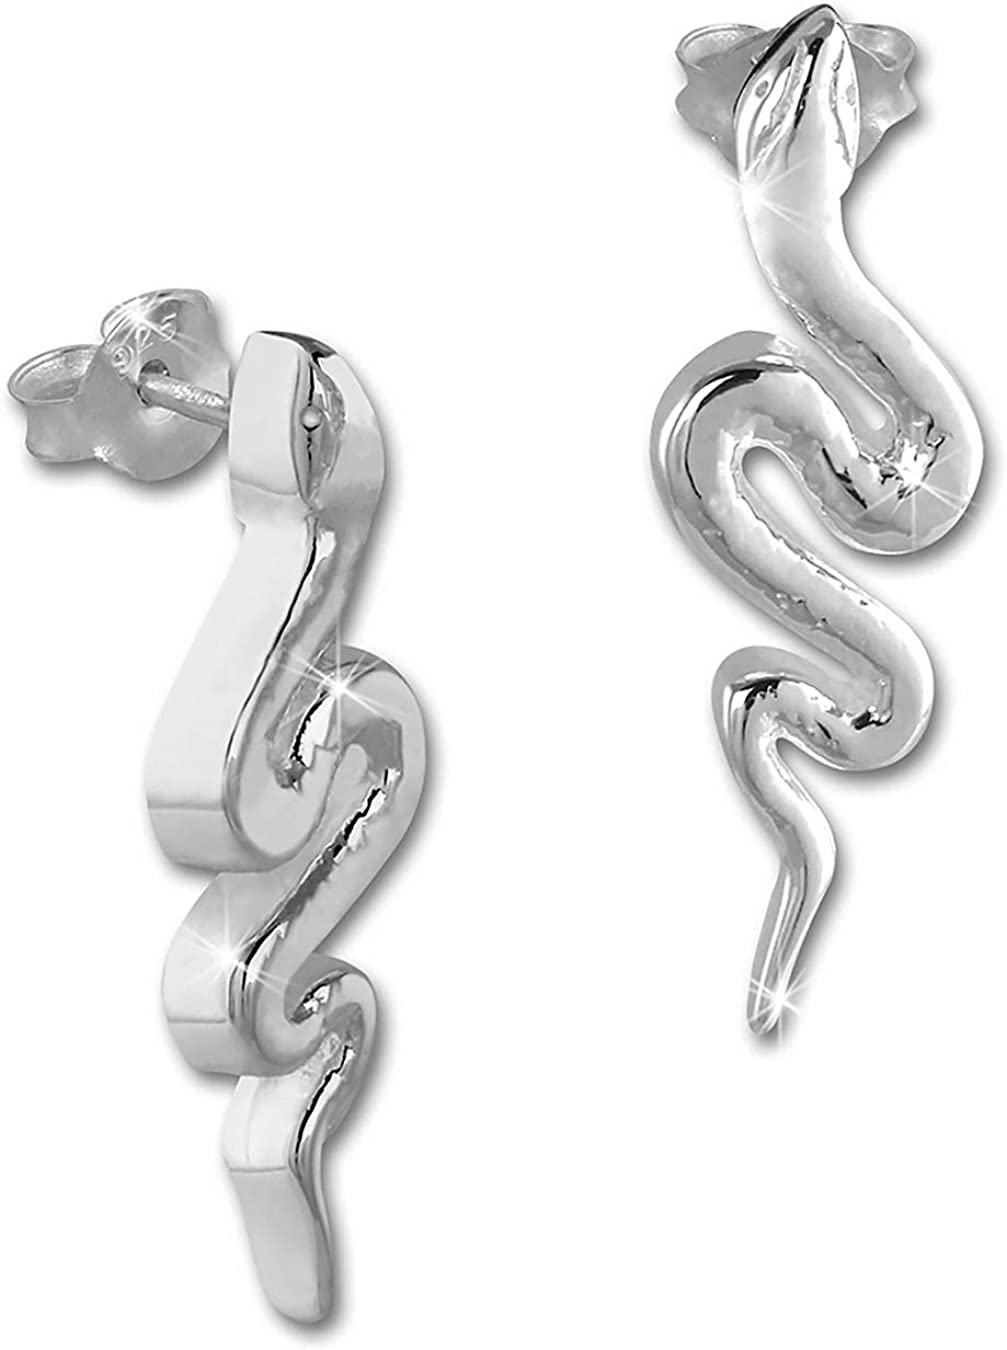 Teenie Weenie-oreilles enfants Argent 925 Boucles doreilles serpent glamour SDO4296J